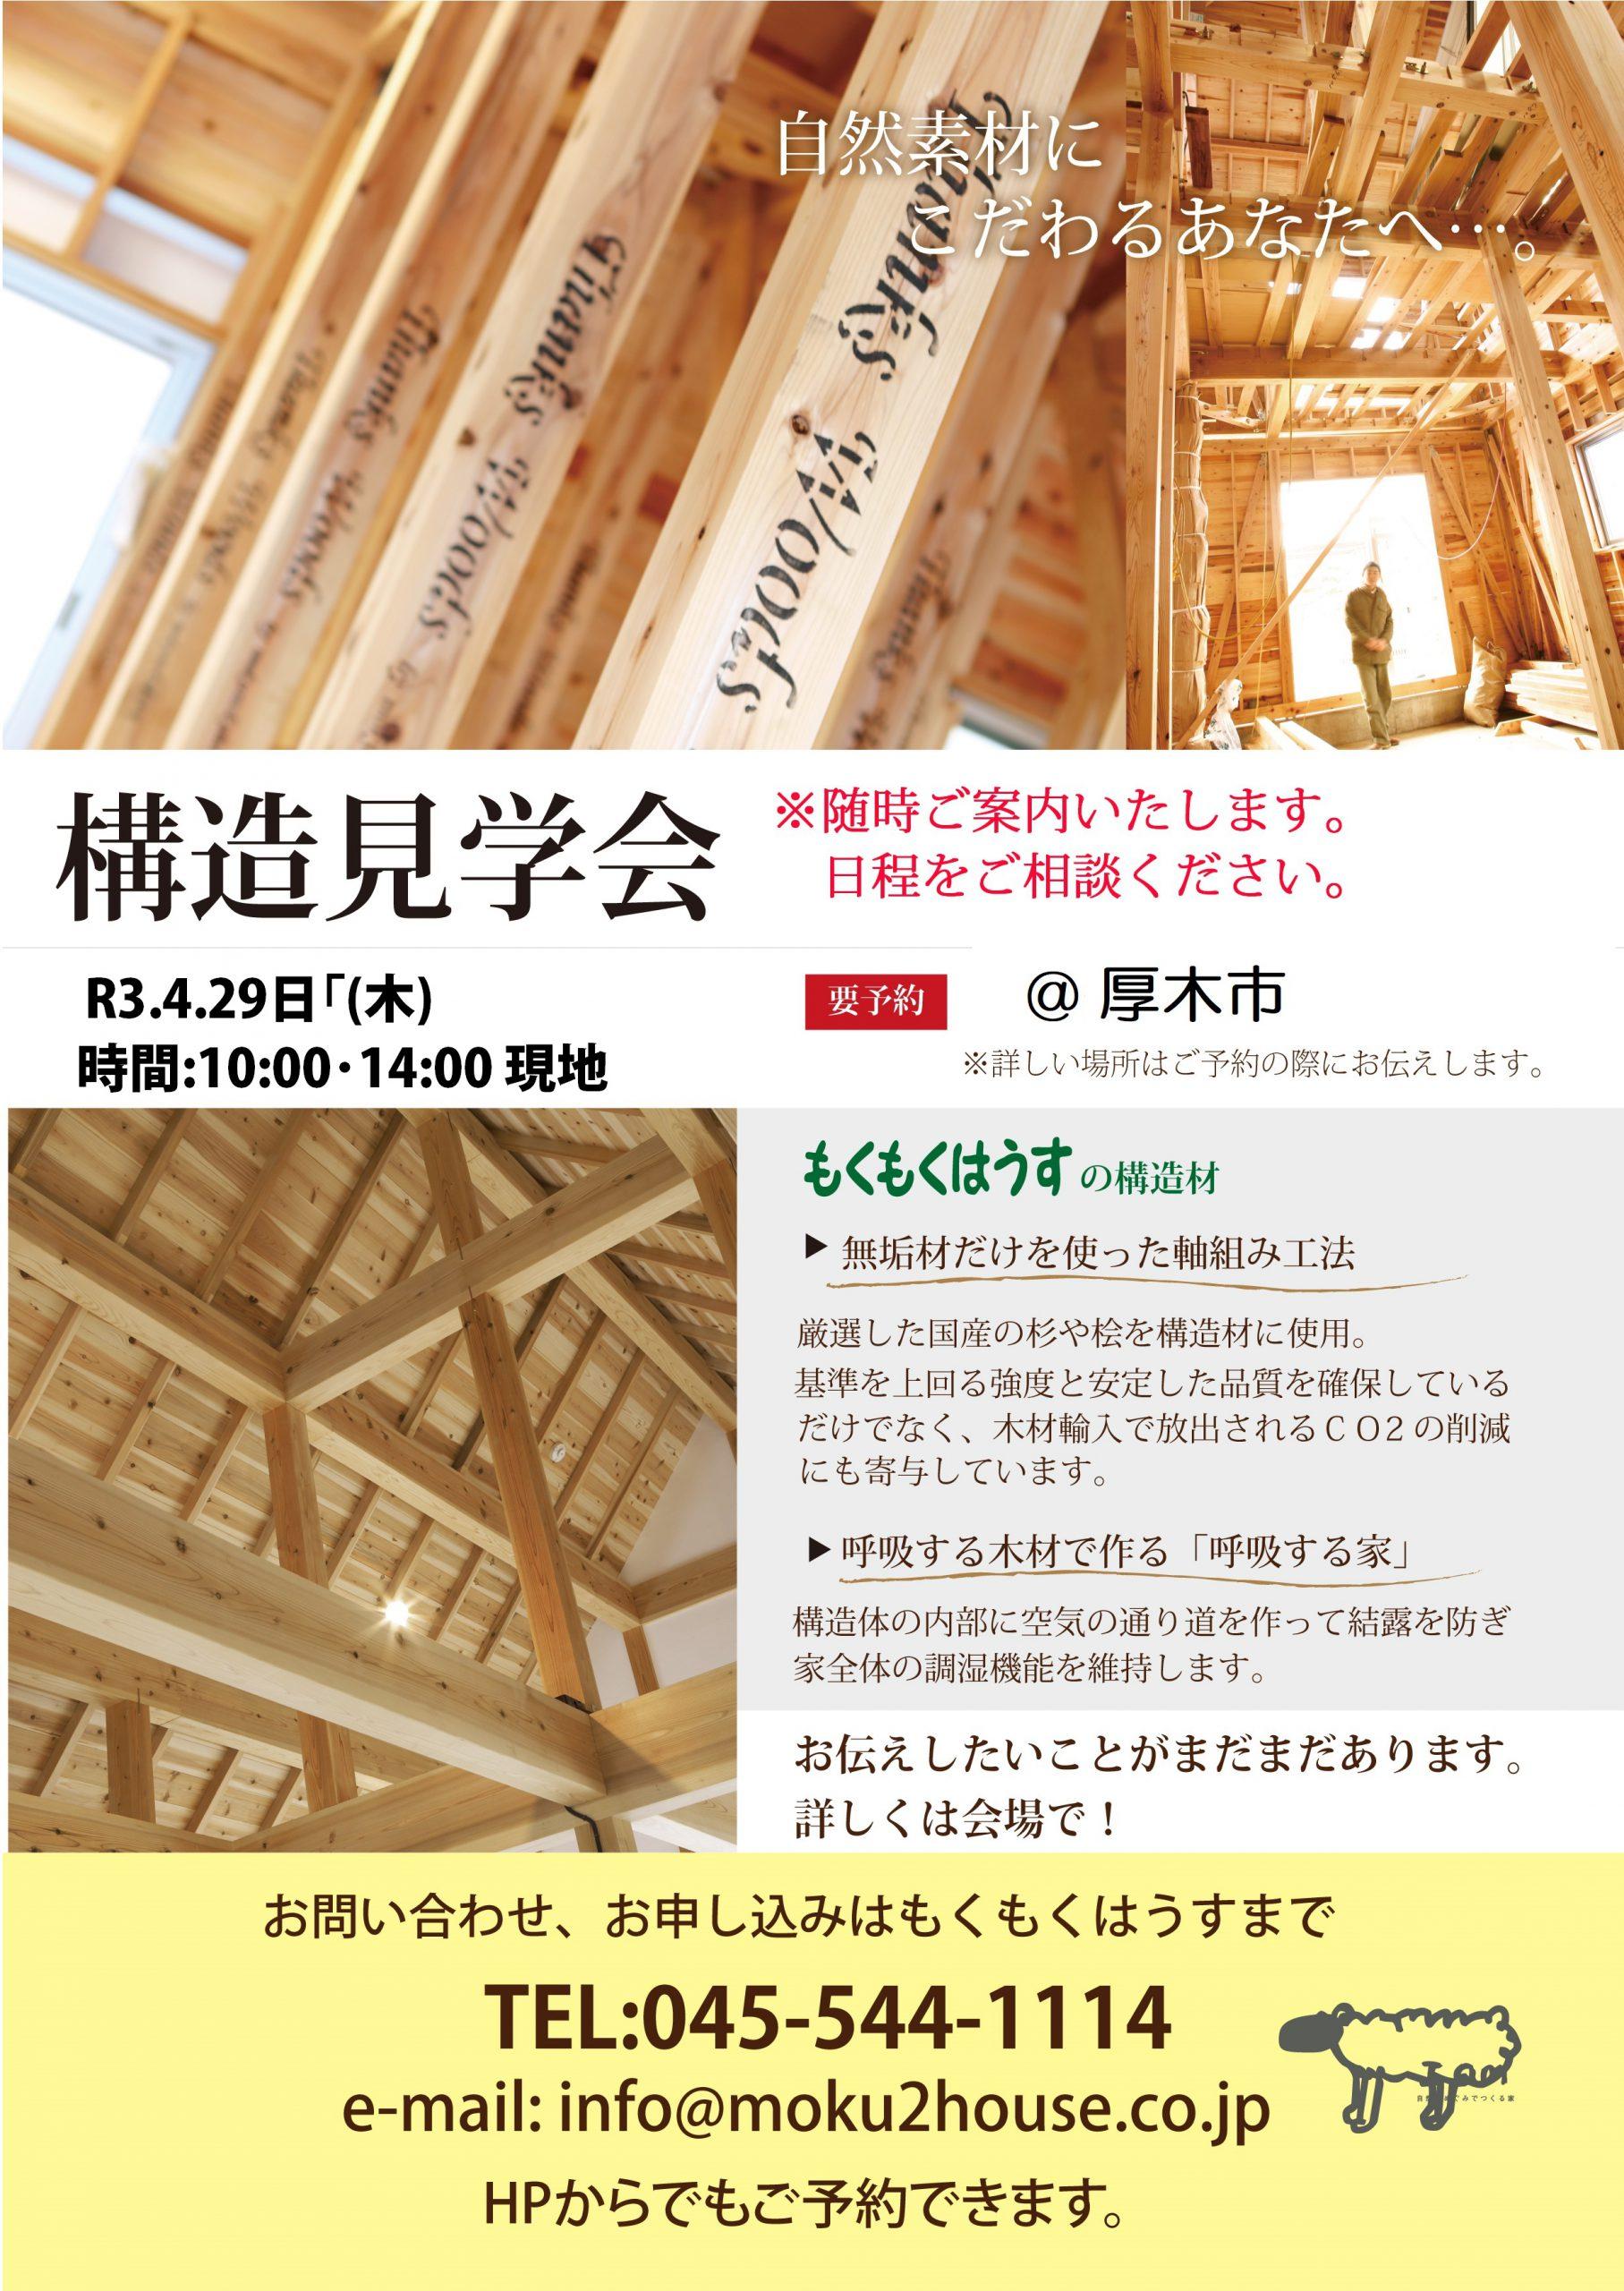 R3年4月 29日 構造見学会 @厚木市